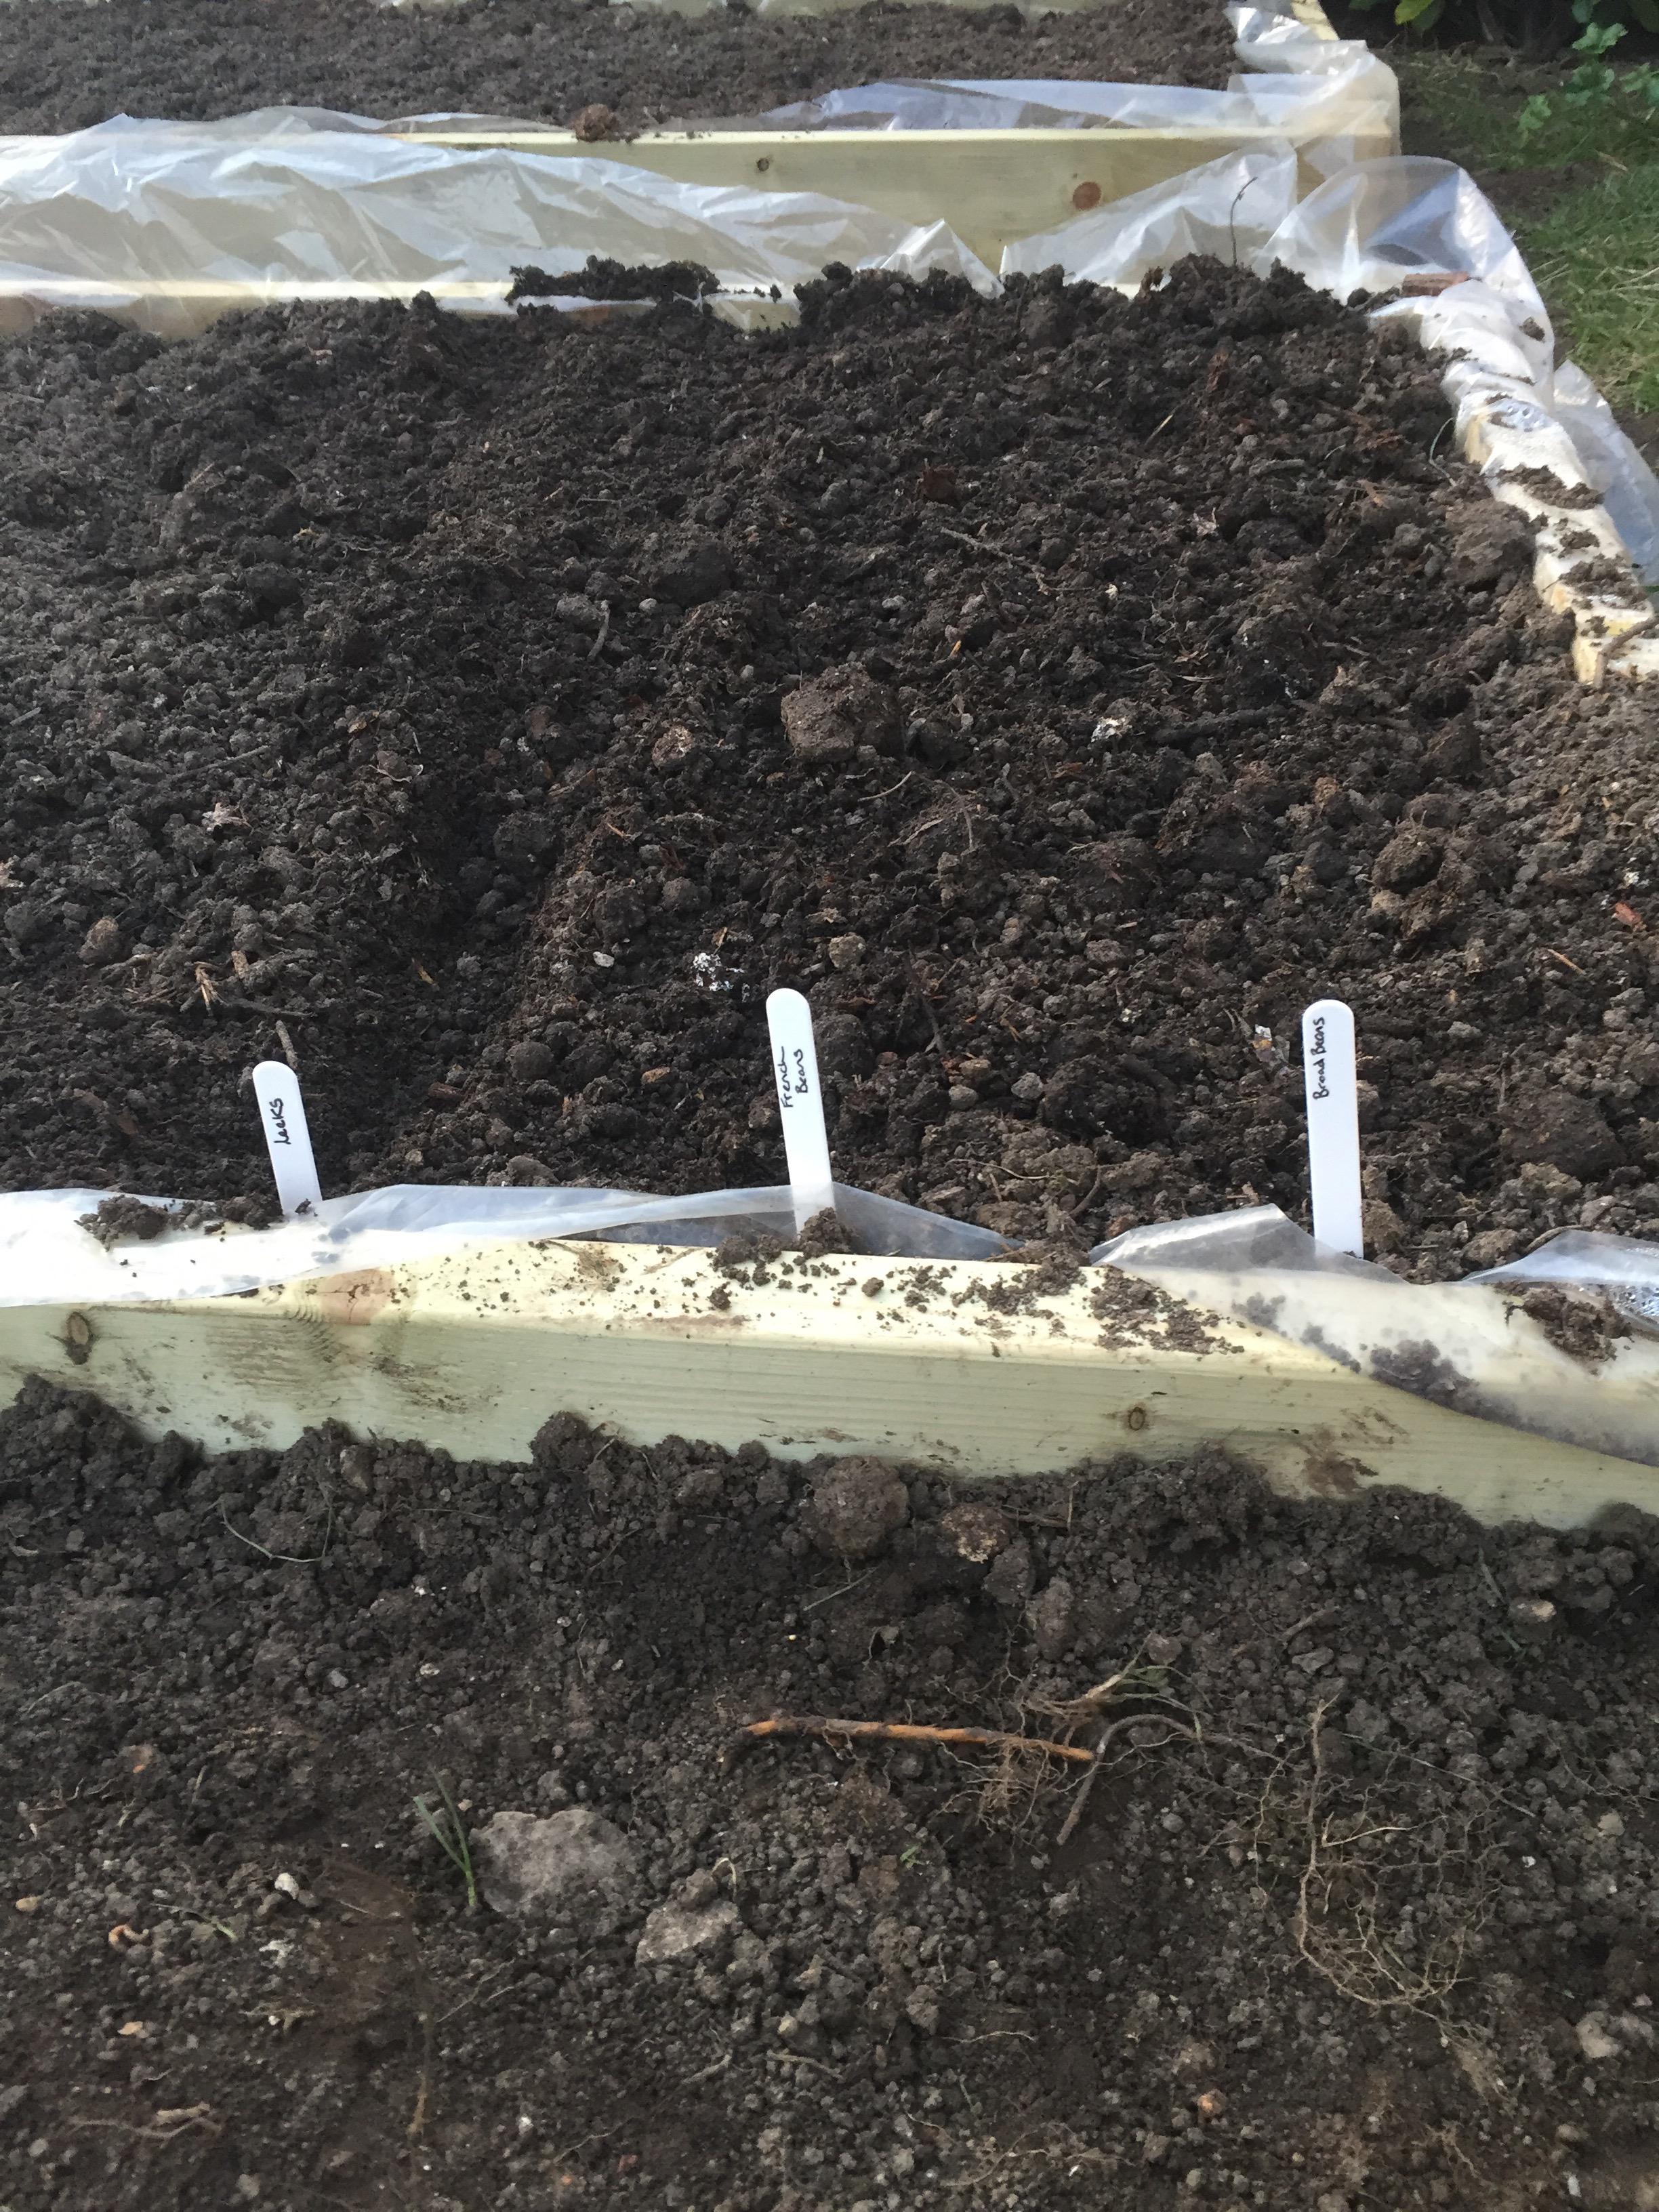 Gardening, I wish I was good at it!